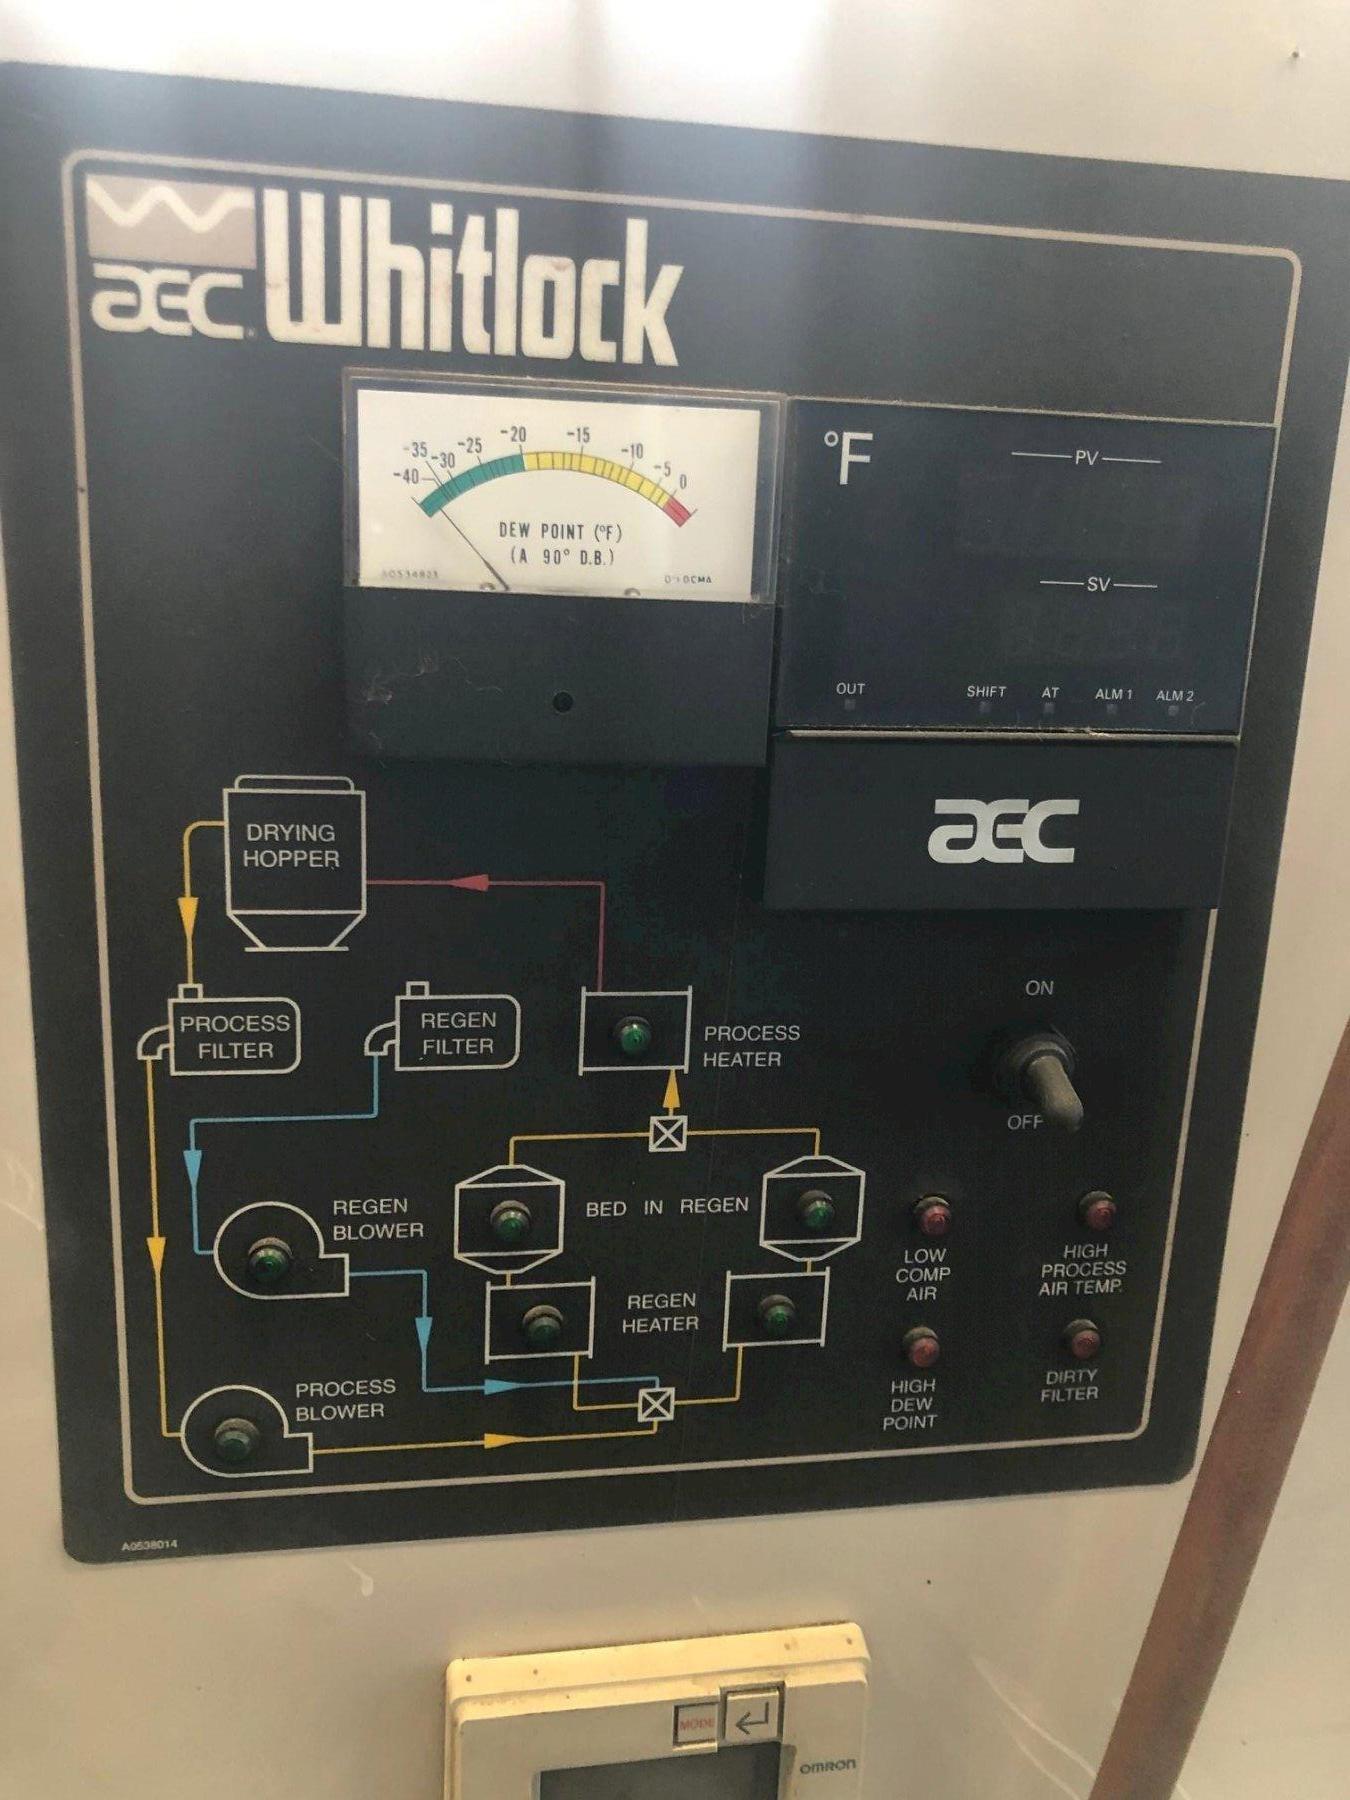 AEC WHITLOCK DRYER MODEL WD90